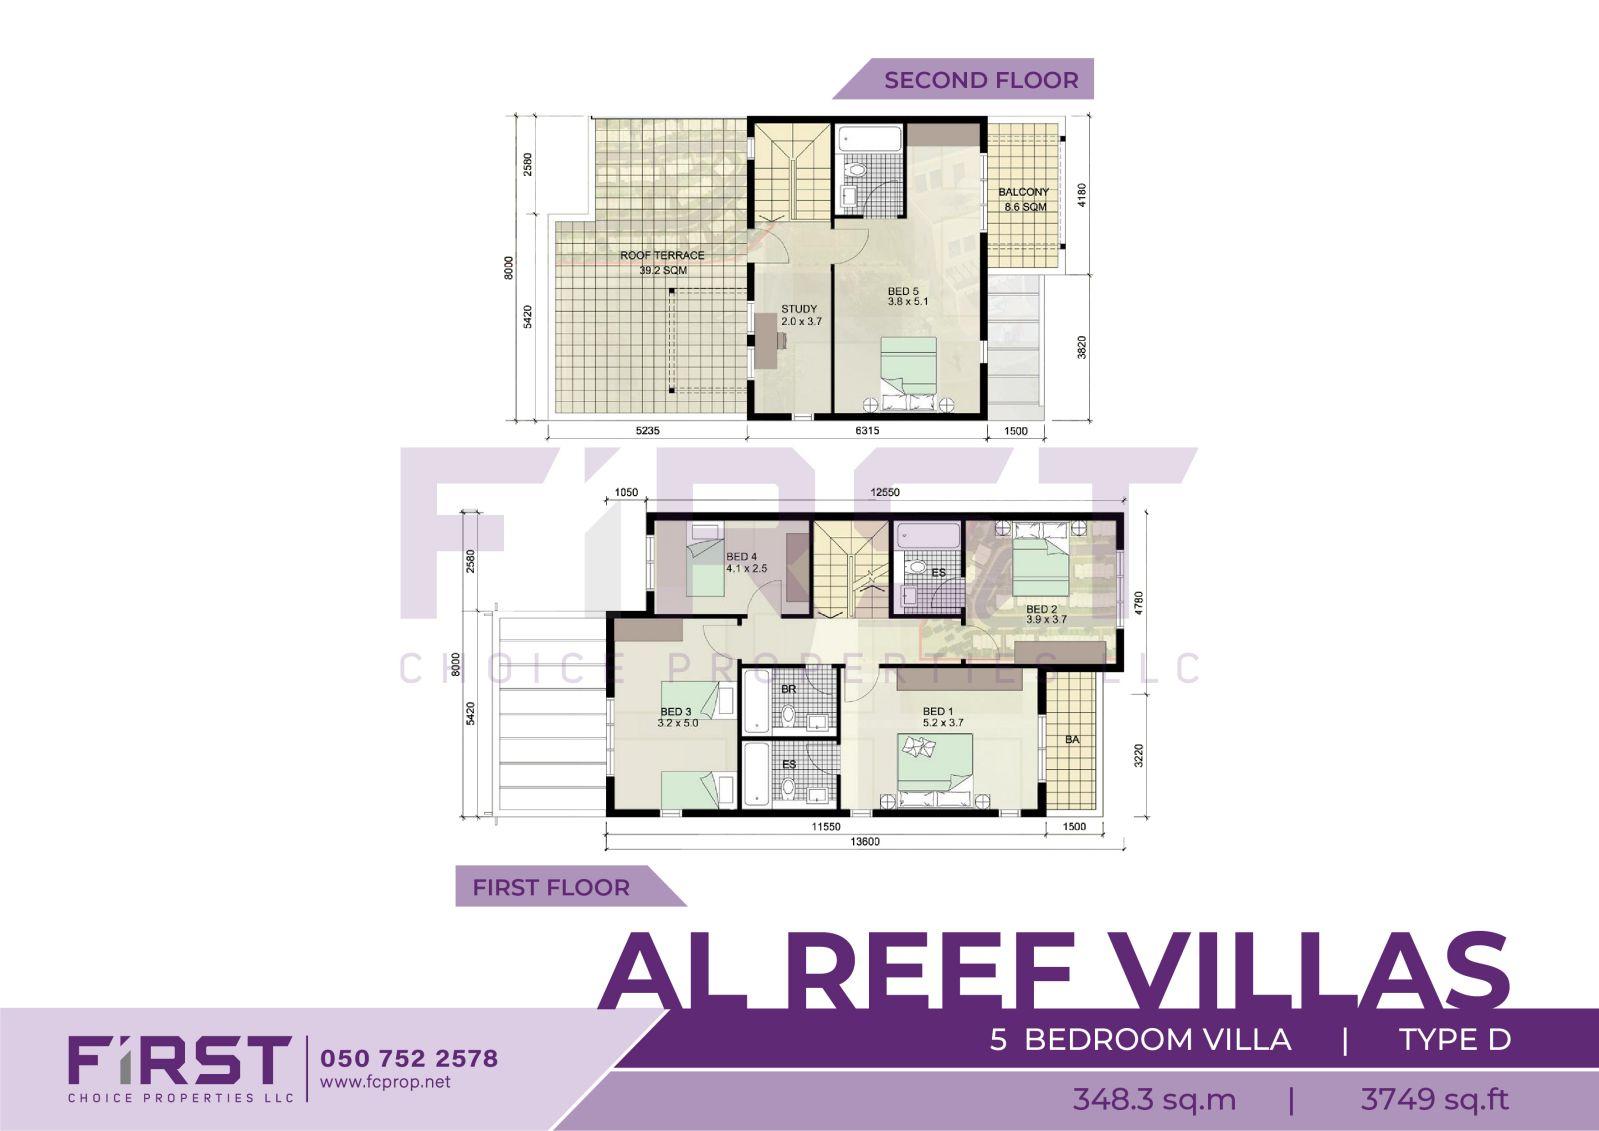 Al Reef Abu Dhabi Al Reef Villas 5 Bedroom Villa Type D 348.3 sq.m 3749 sq.ft 1.jpg